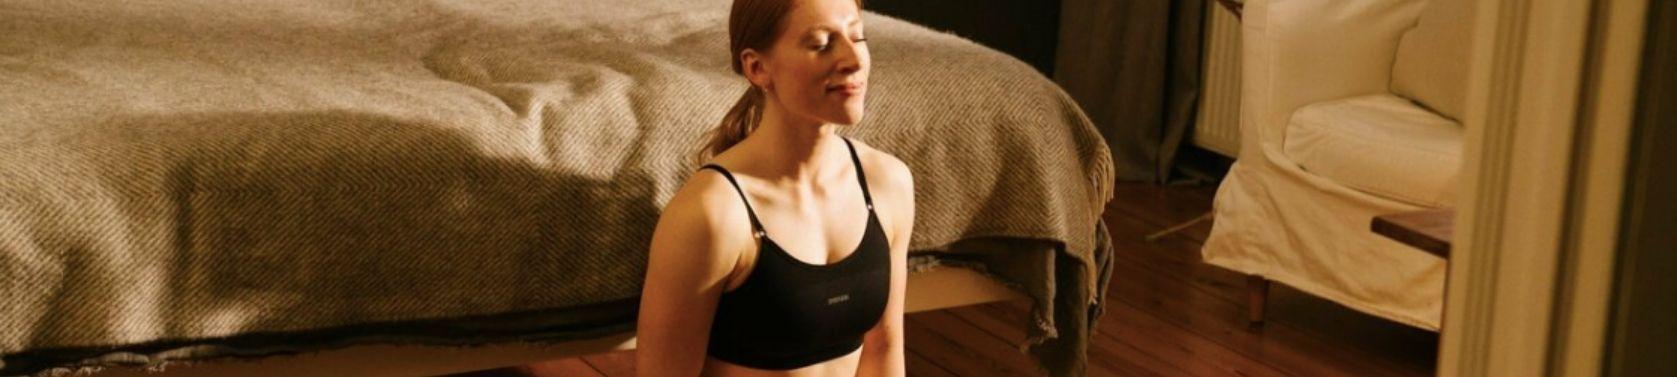 Entgiftung des Körpers: 6 Hacks für dein Daily-Detox